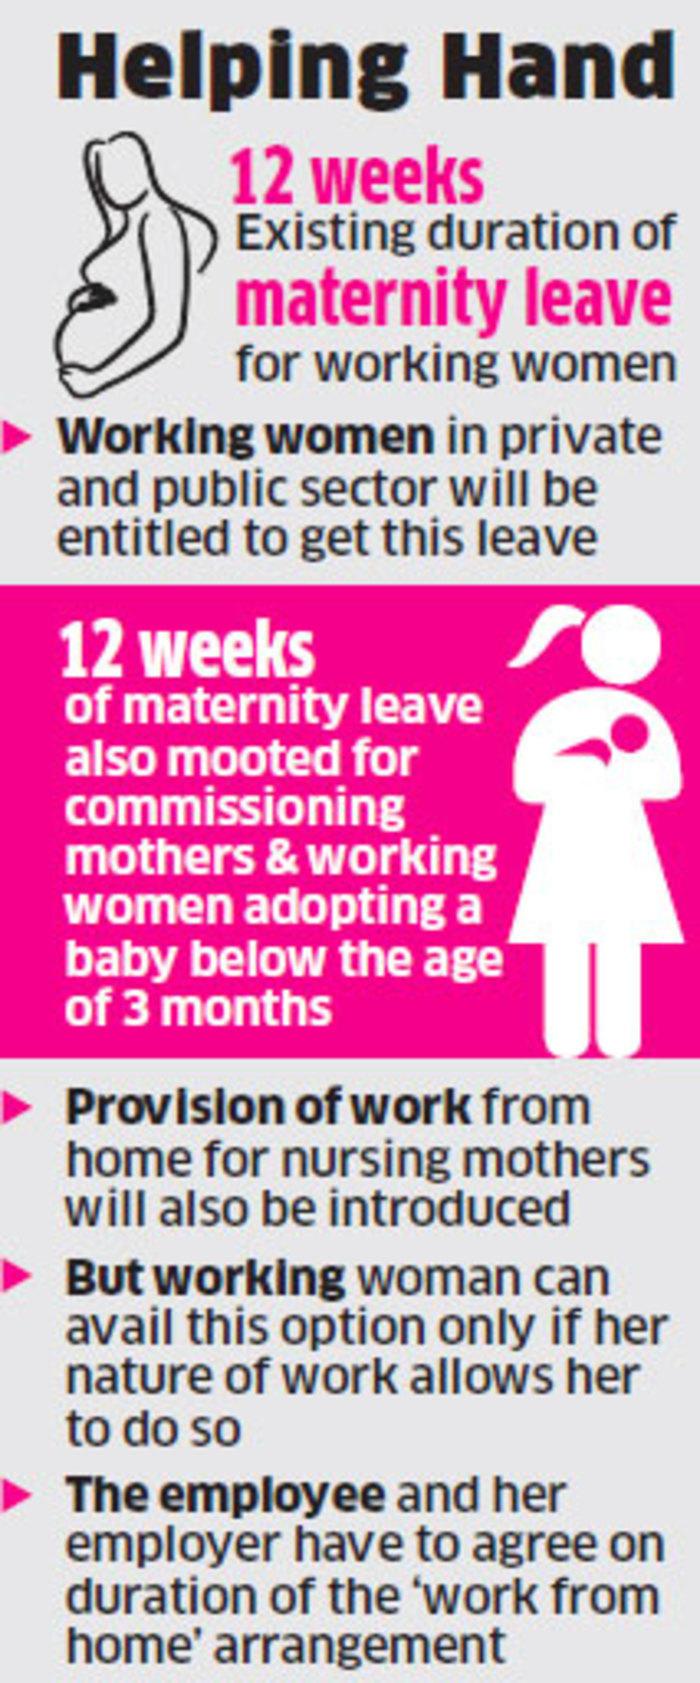 Uidai warns against agencies printing plastic aadhaar cards economic times - Women May Get Maternity Leave For 26 Weeks Bandaru Dattatreya May Table Bill Today Retail News Et Retail